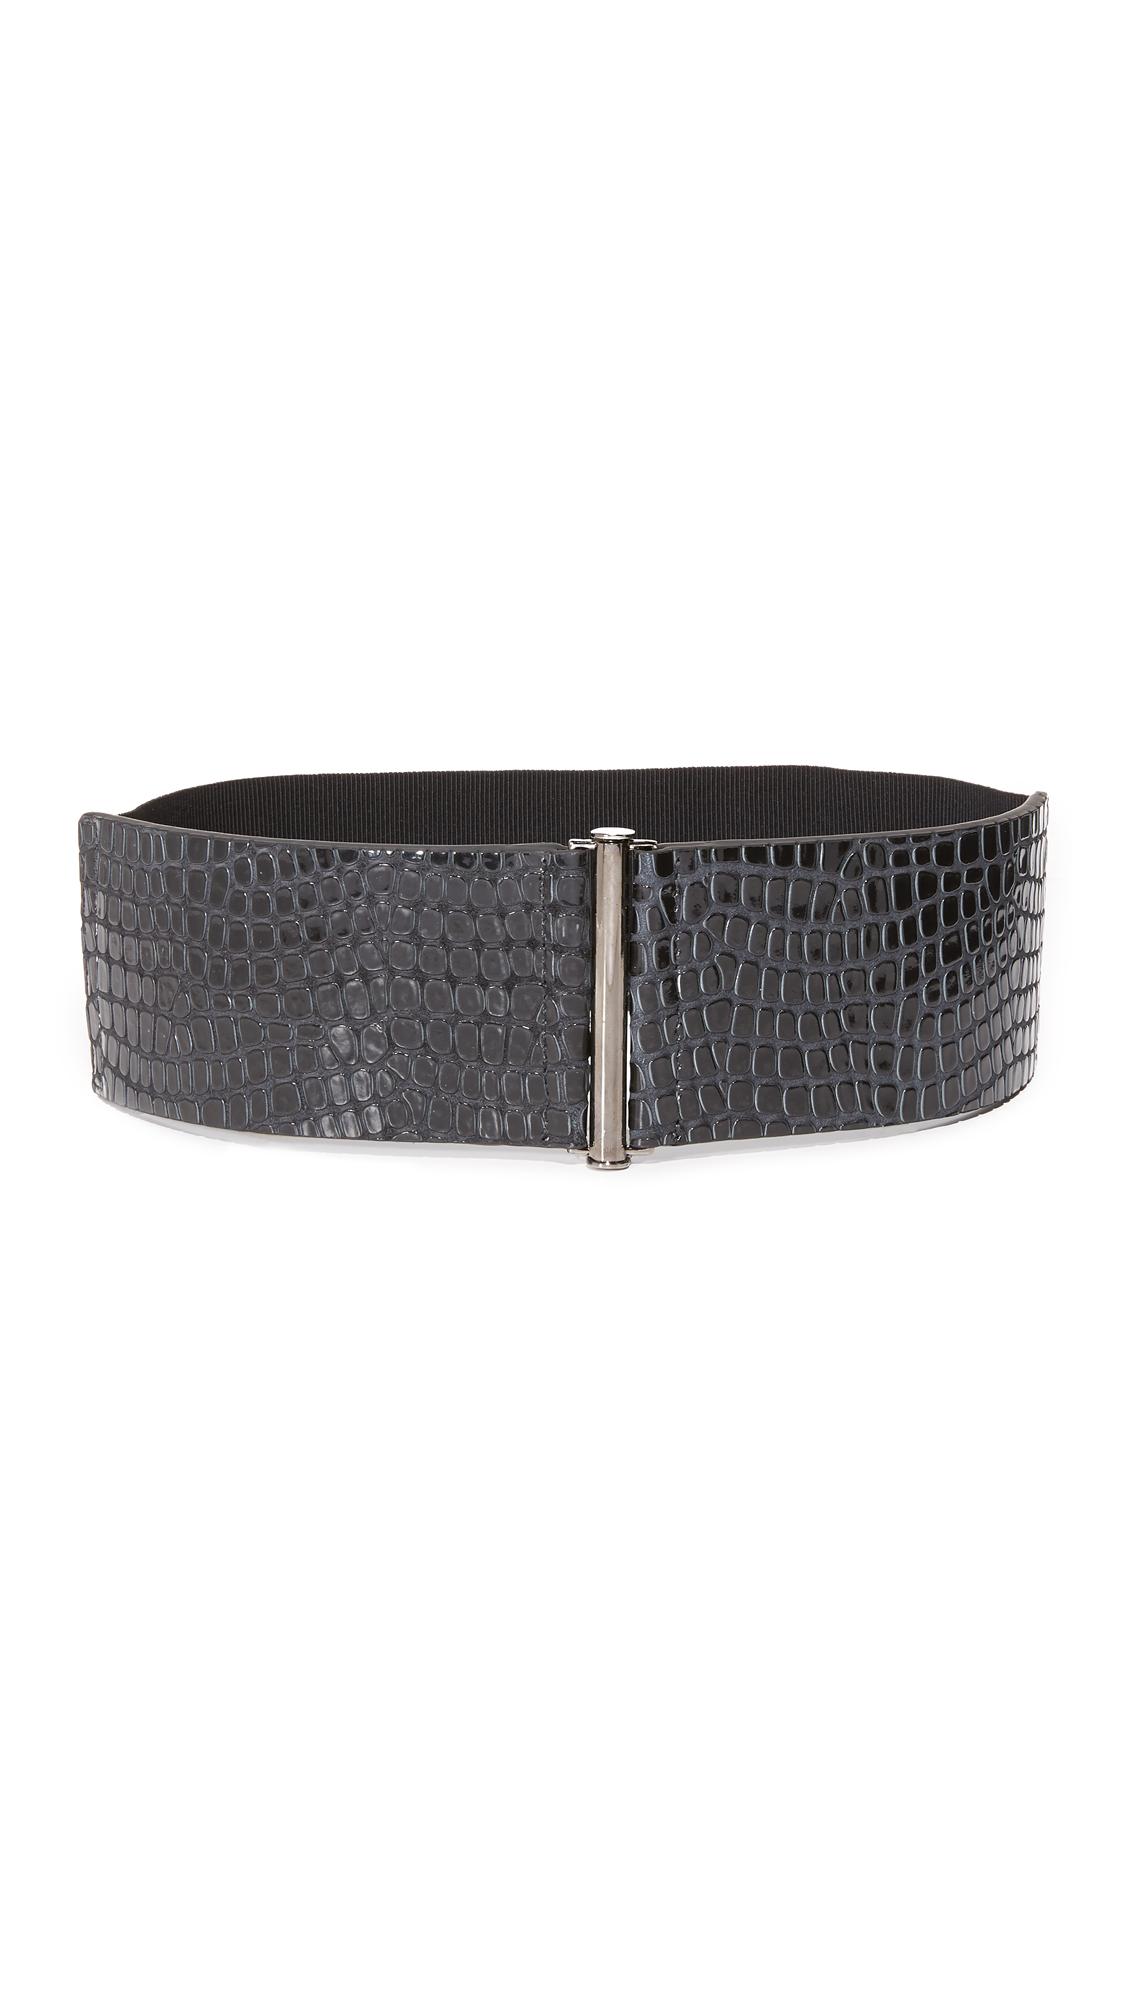 Zero + Maria Cornejo Mica Belt - Black at Shopbop